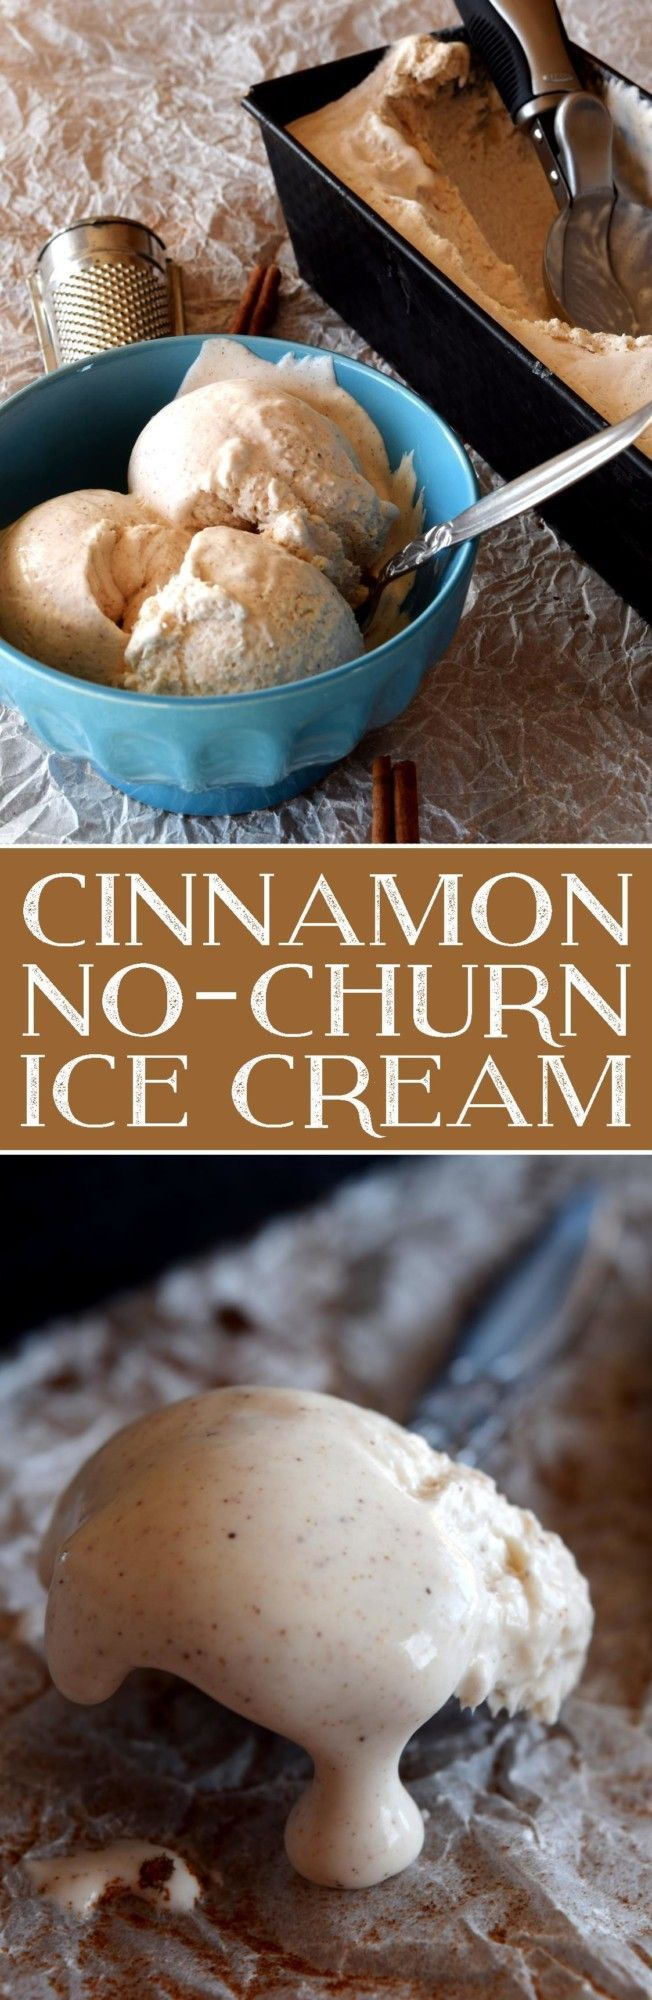 Cinnamon No Churn Ice Cream